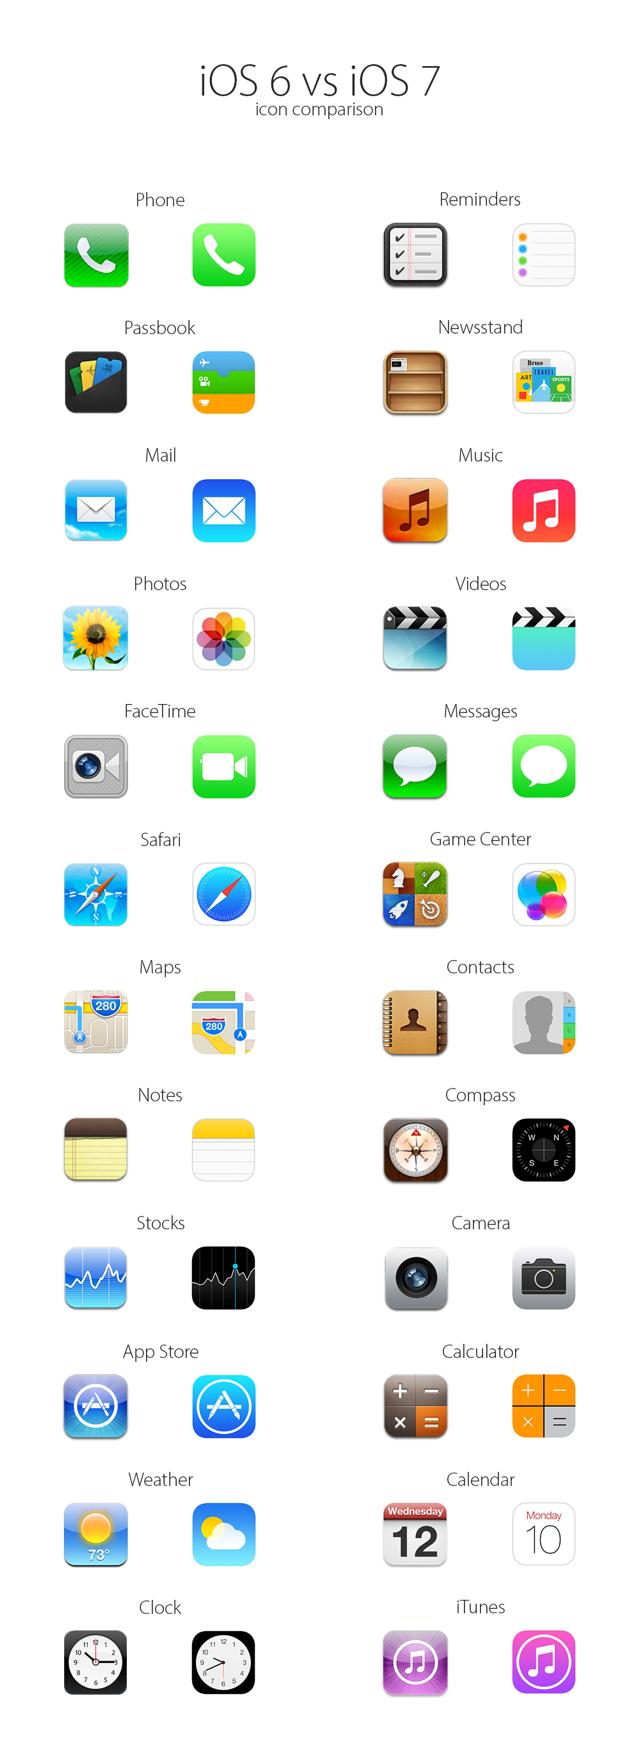 iOS 6 vs iOS 7 - icons